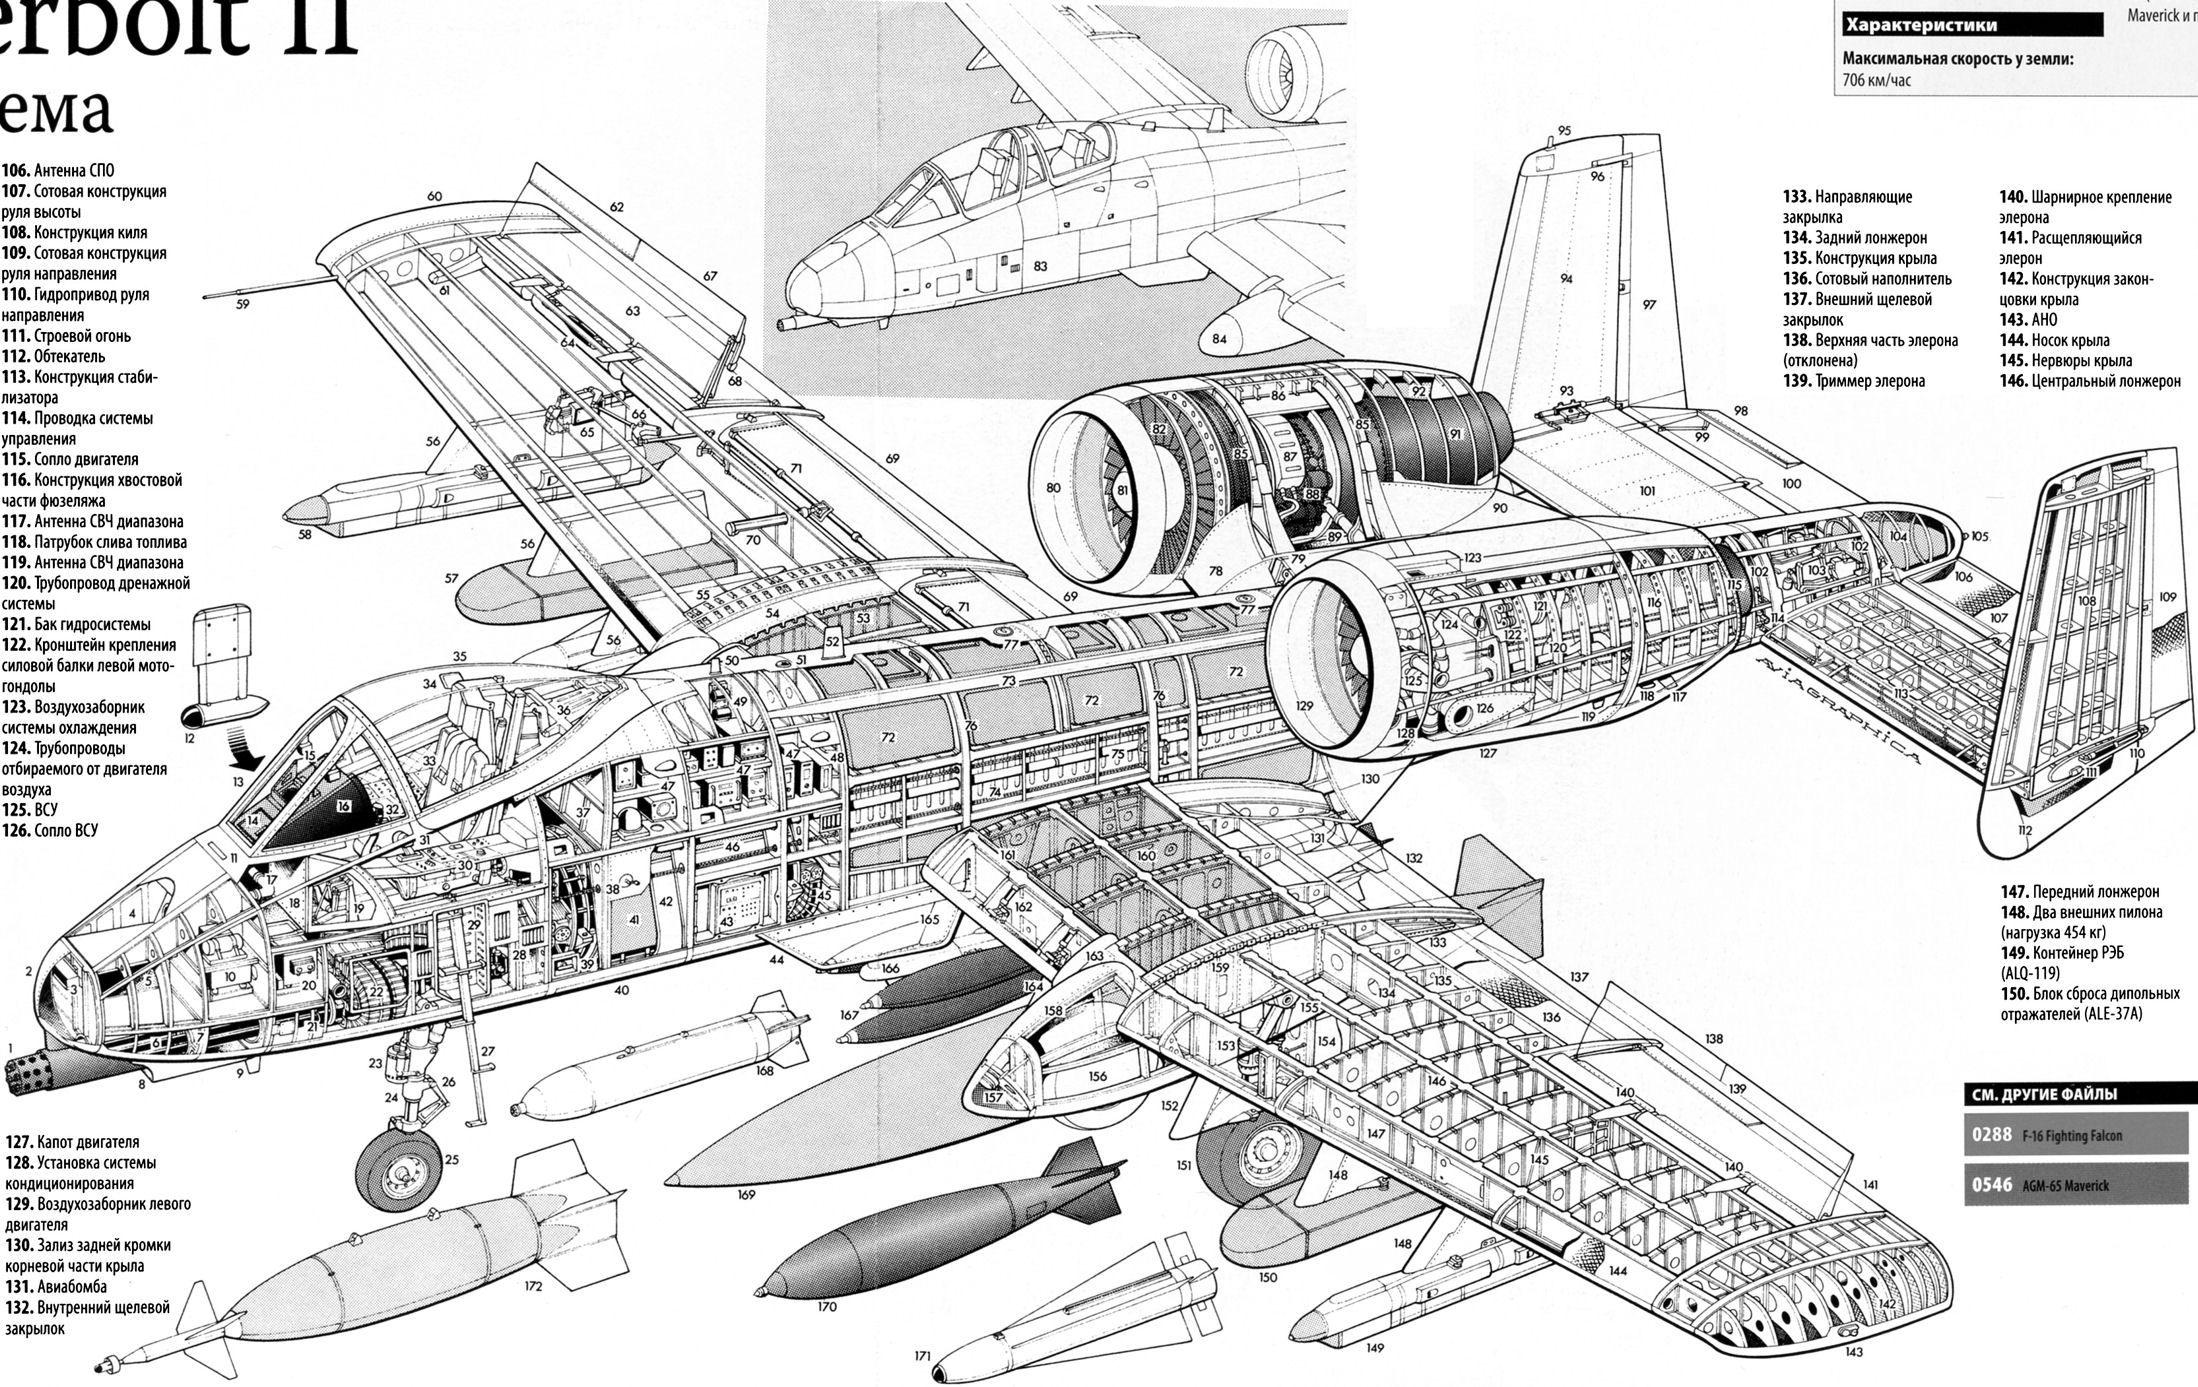 0167 03 2 3 jpg 2 198 1 387 pixels army references pinterest rh pinterest co uk fighter jet engine diagram fighter aircraft diagram